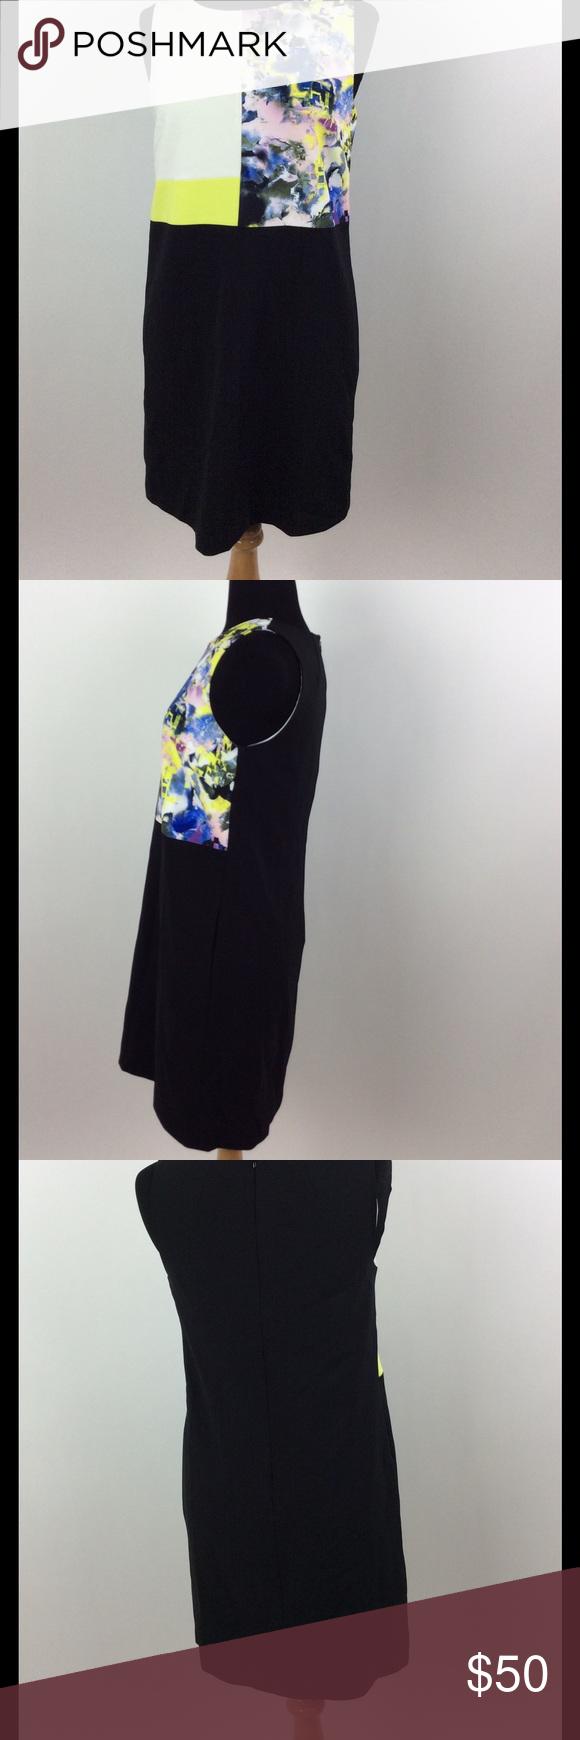 Ellen tracy nwt see size chart for more measurements sku  dresses mini also my posh picks rh ar pinterest